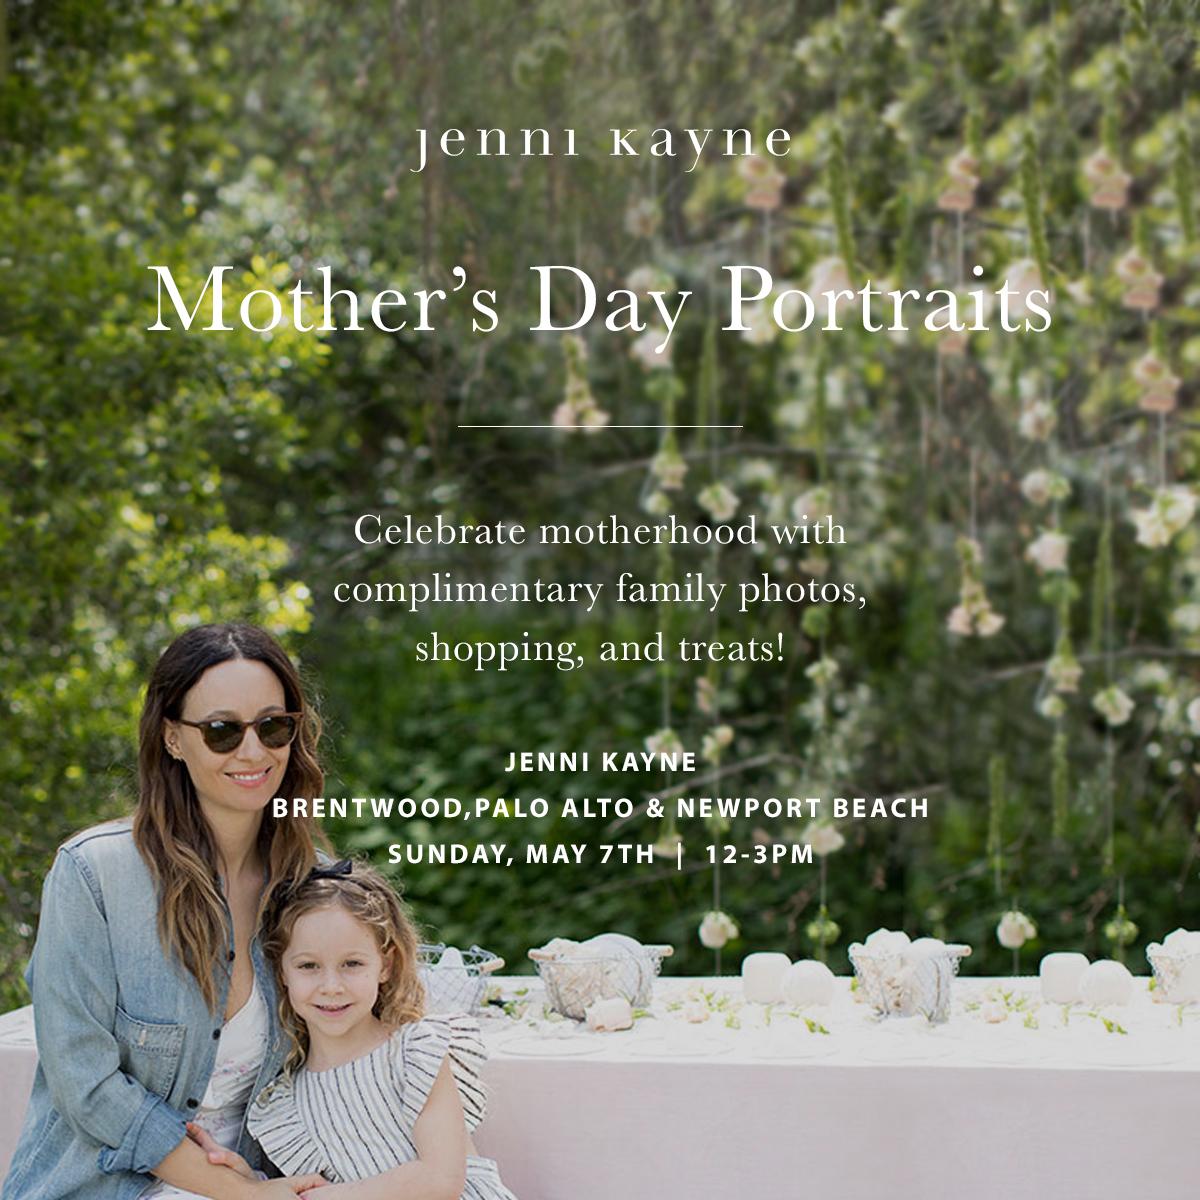 MothersDayPortraitInvite_LMV[1][3] copy.jpg